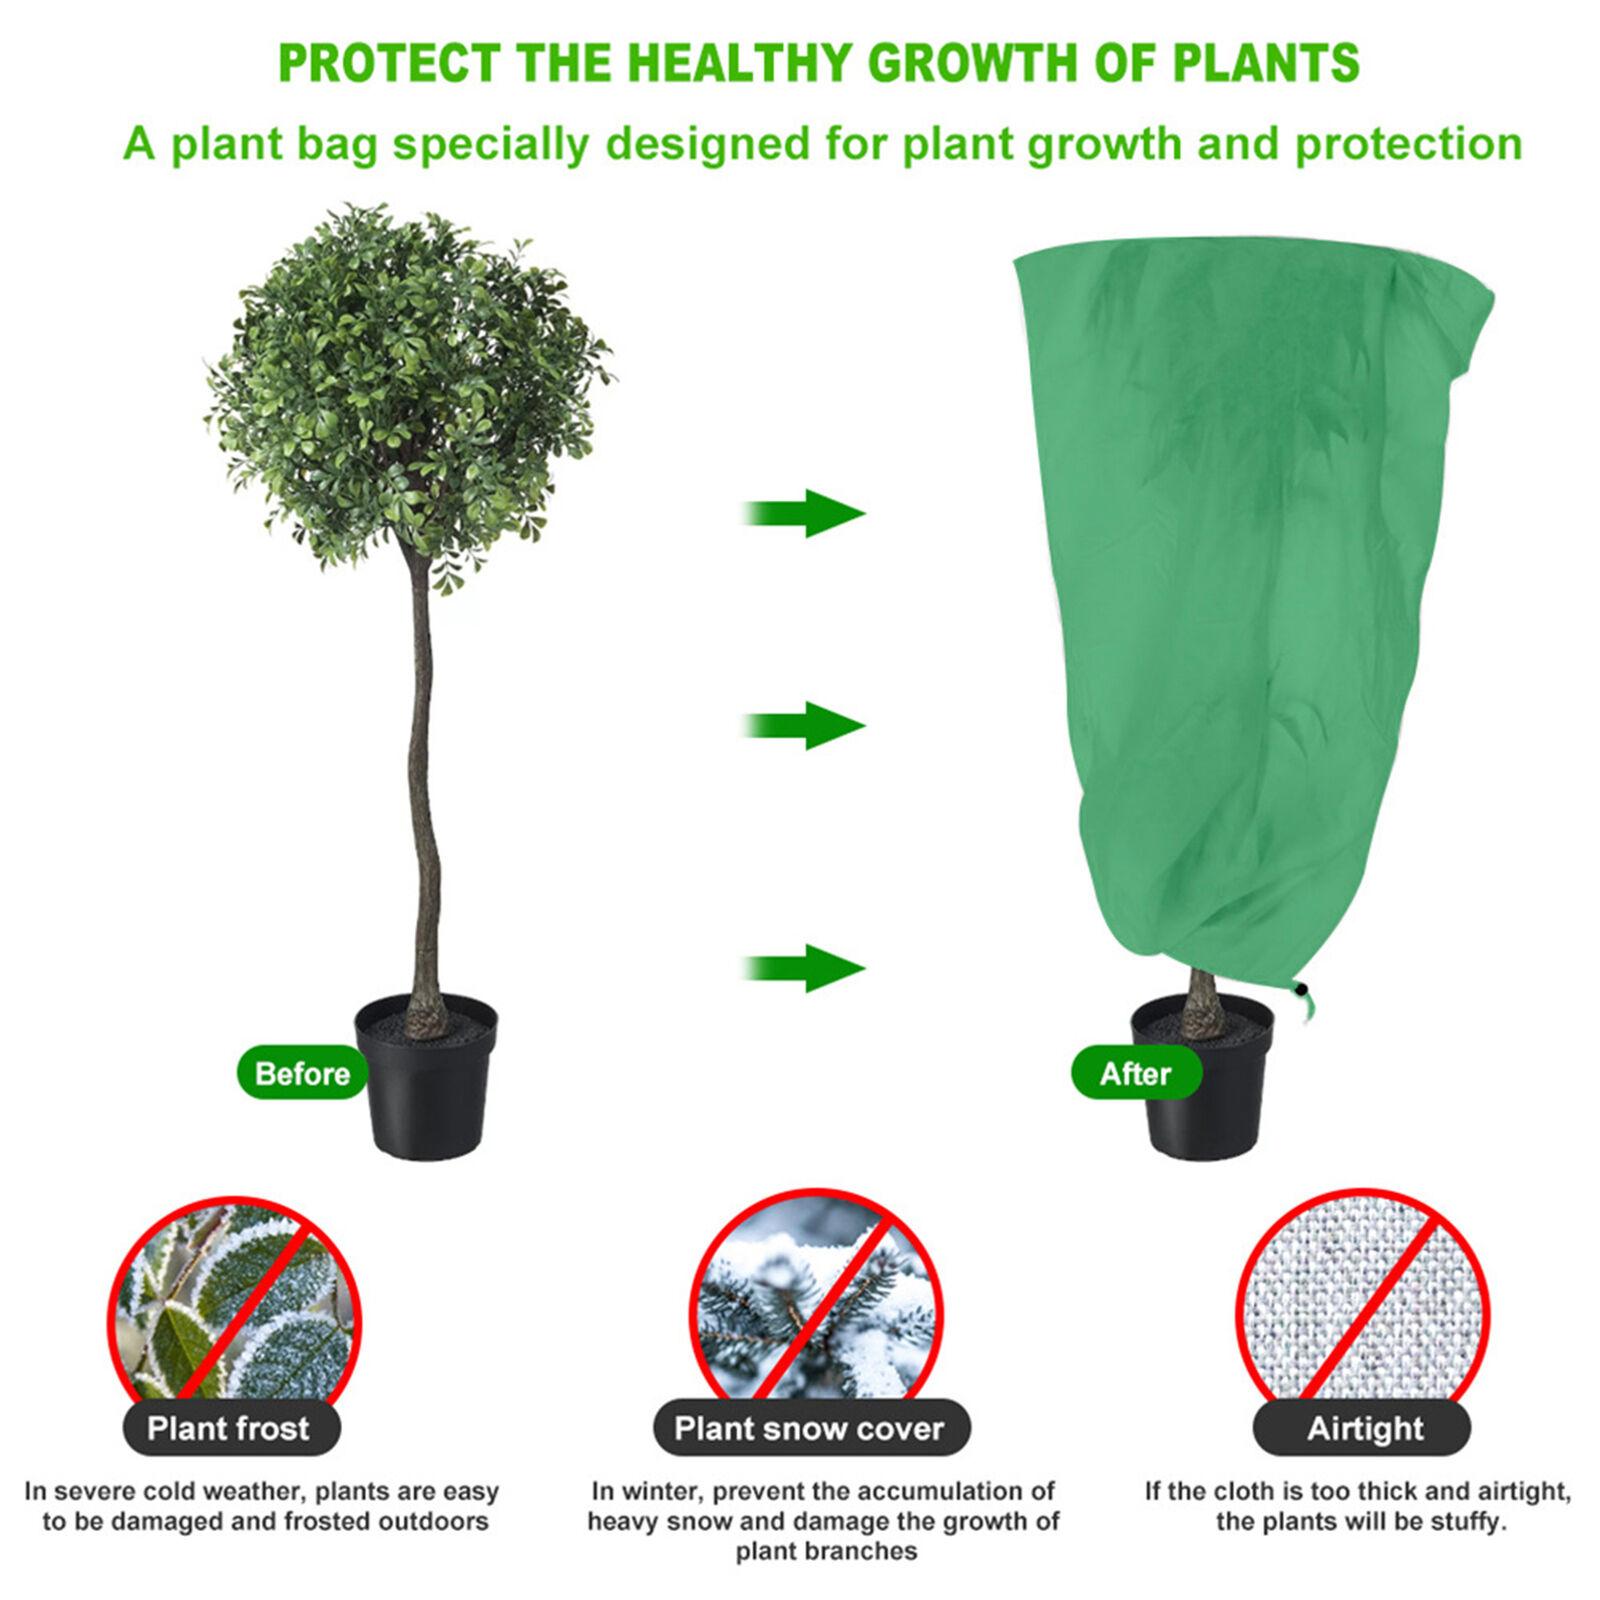 Tree Protecting Bag Easy Use Keep Warm Reusable High Quality for Garden